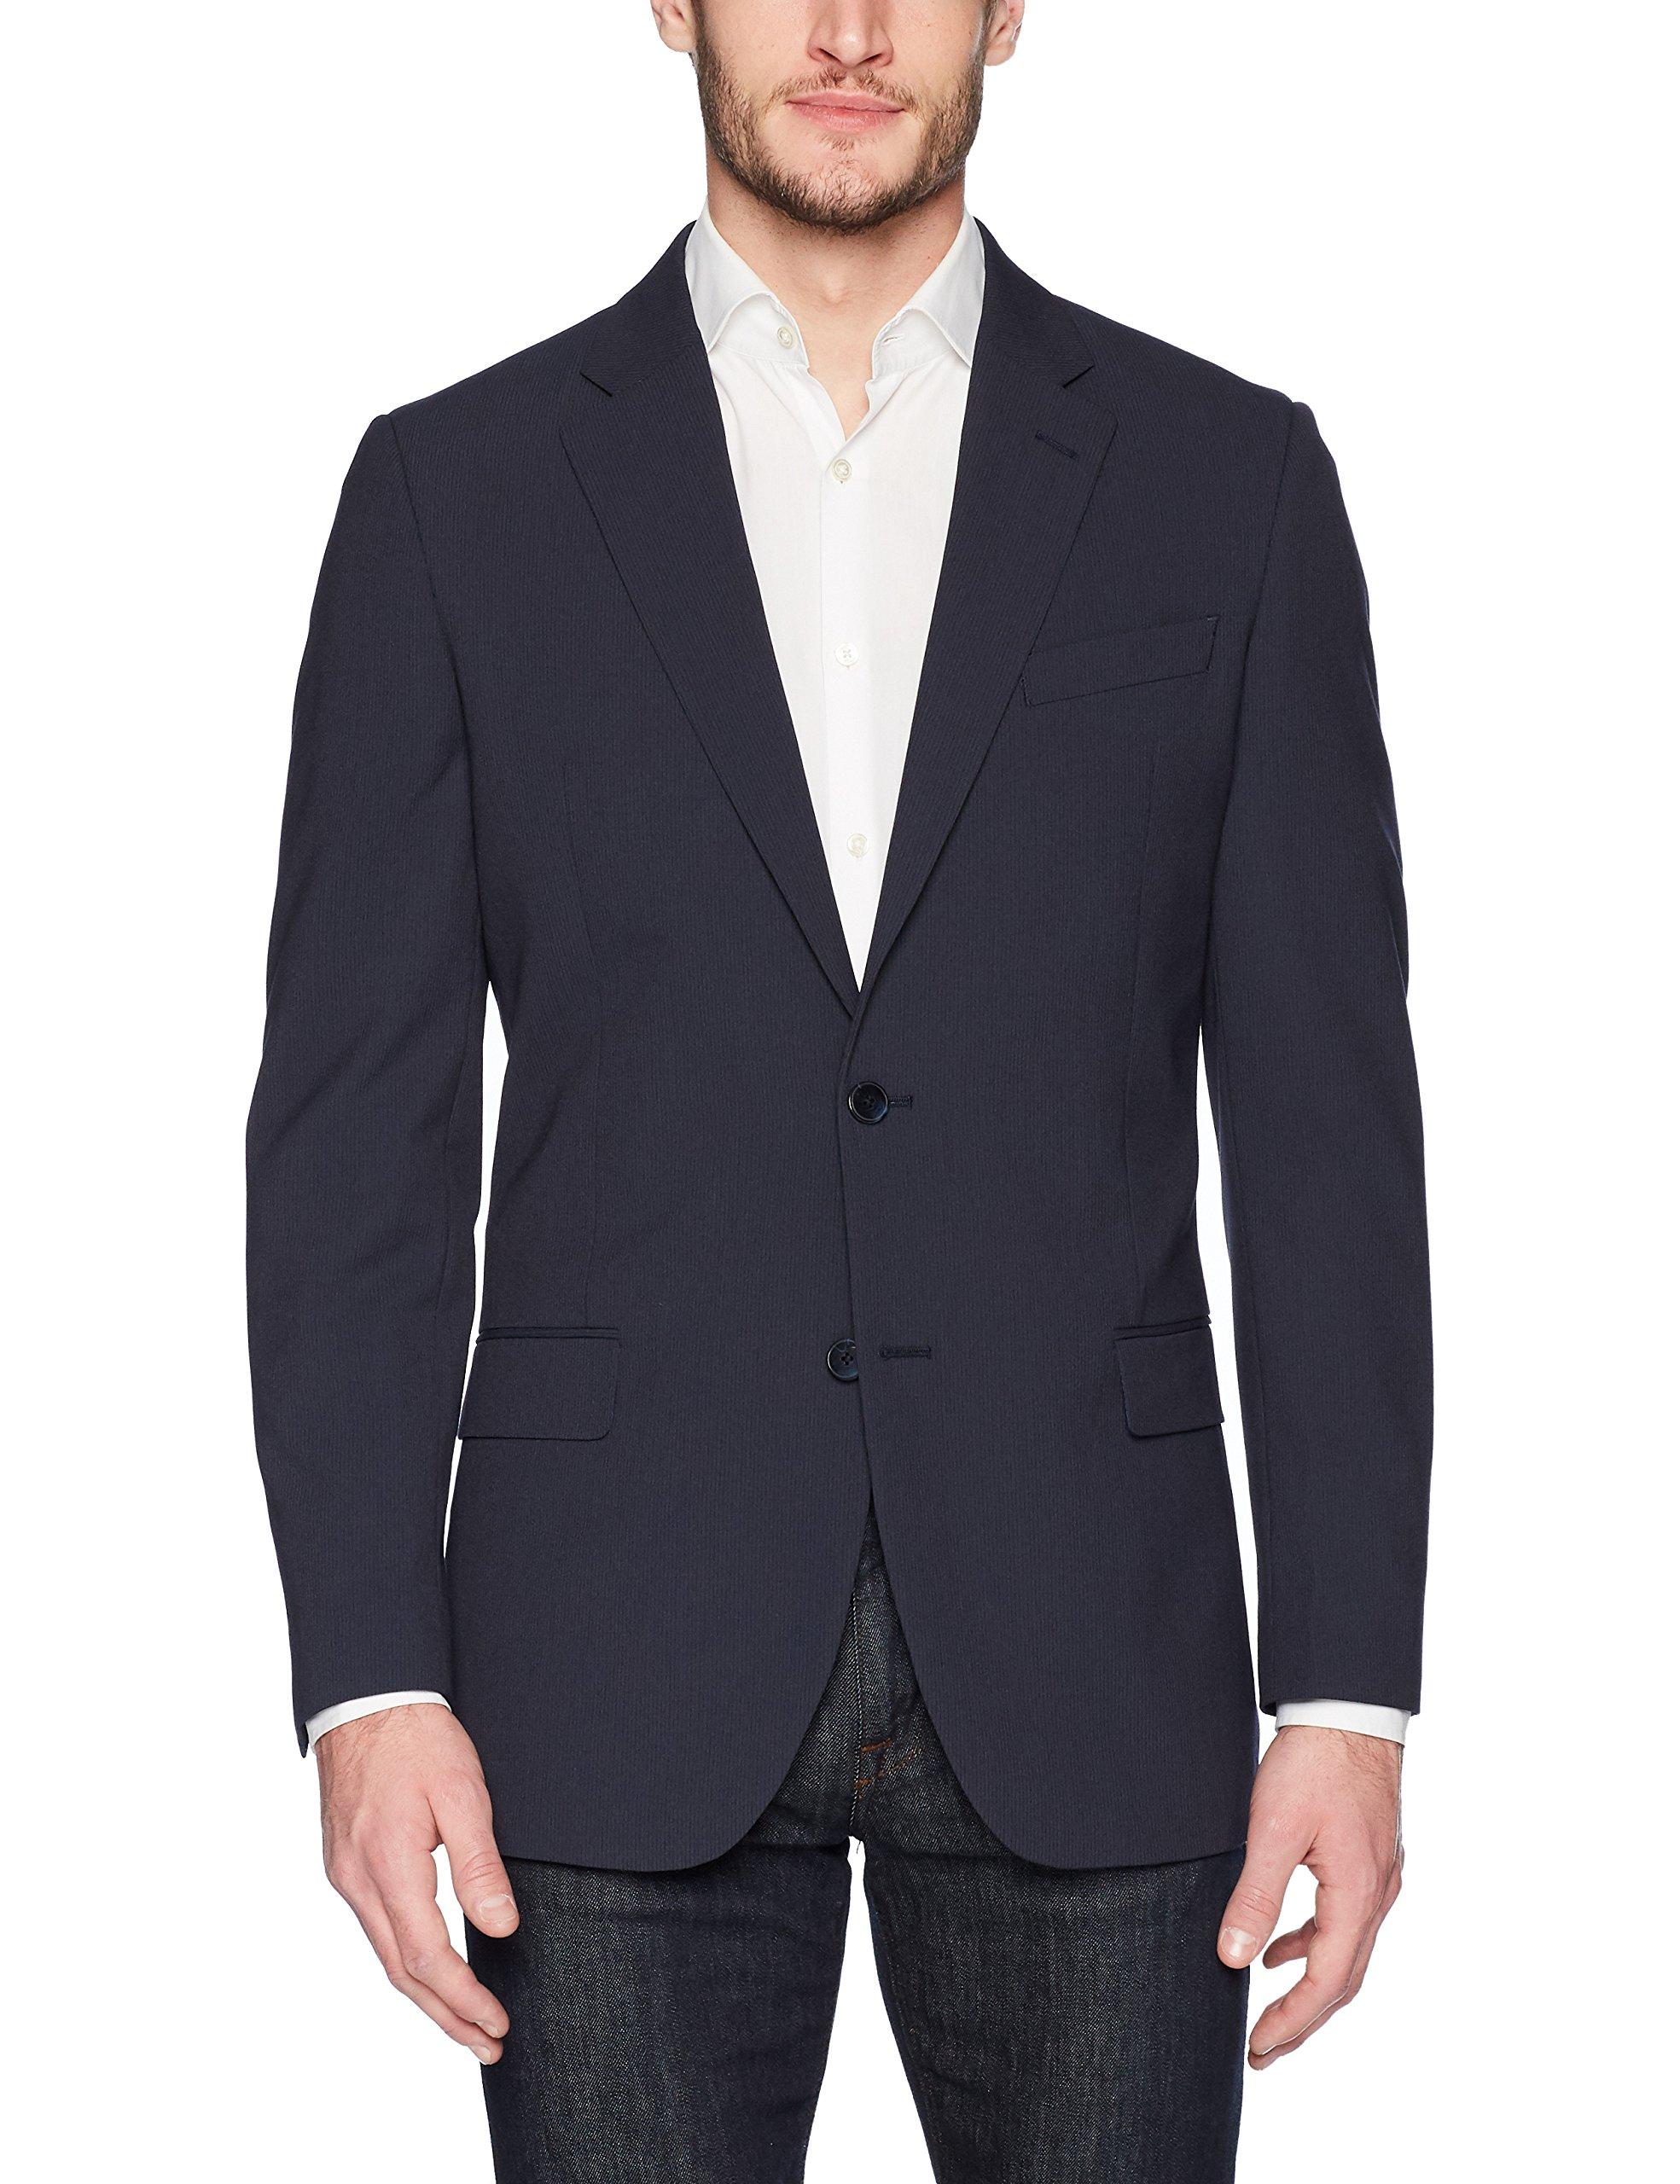 Nautica Men's Bi-Stretch Slim Fit Suit Separate (Blazer and Pant), Navy Stripe Blazer, 44 Regular